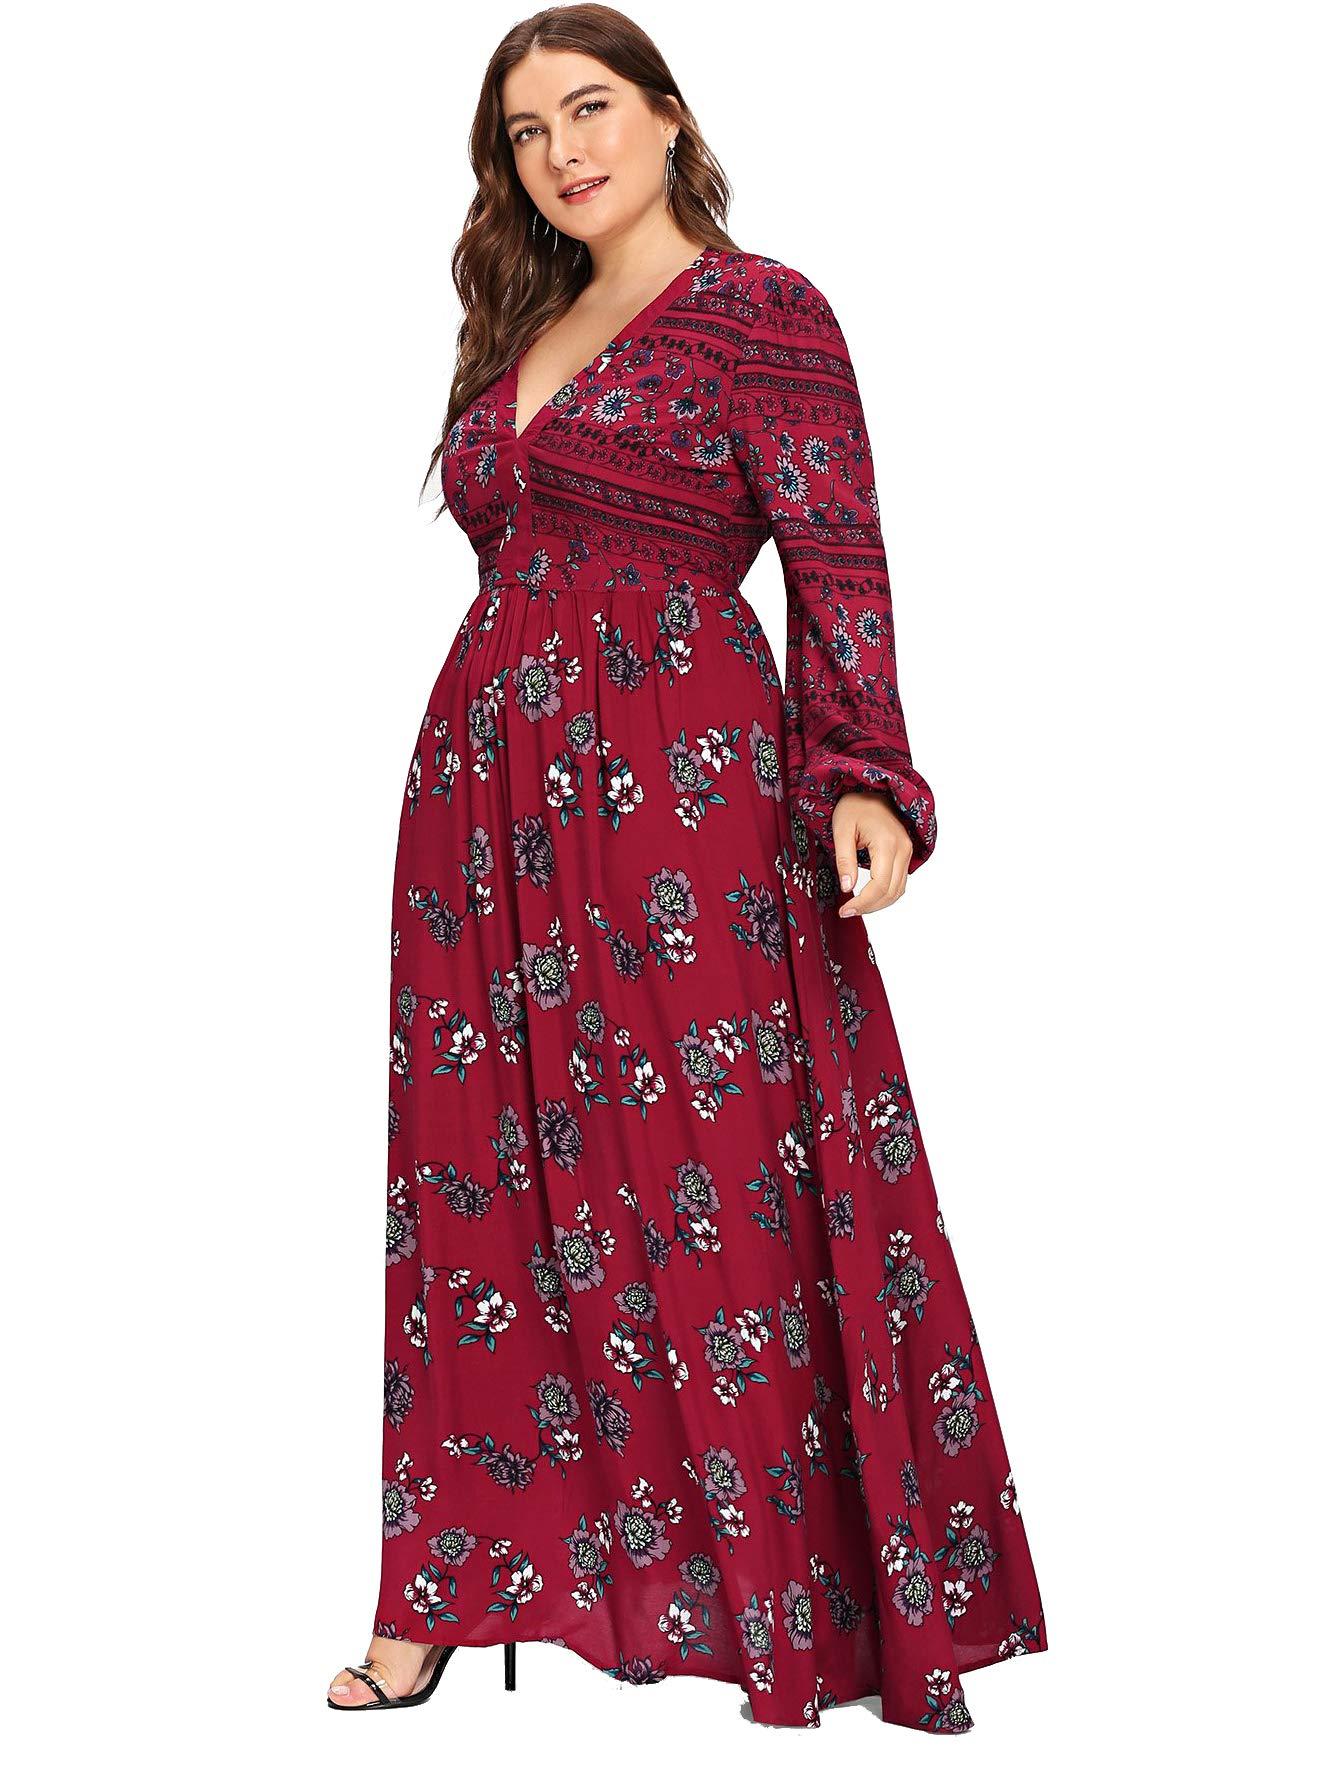 764272af91 Milumia Women Plus Size Empire Waist Homecoming Party Wrap V Neck Dress  Wine 1X